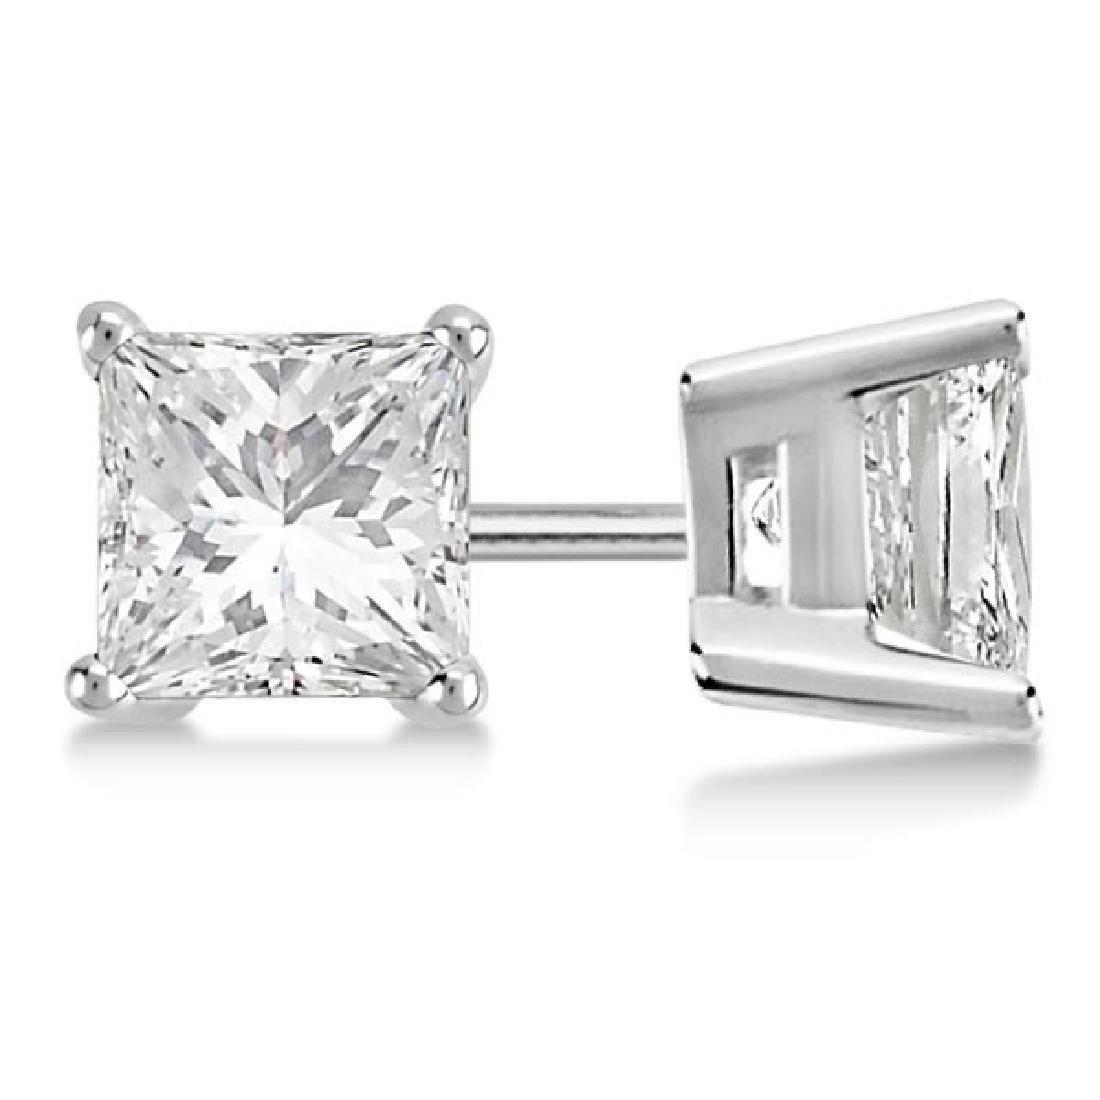 Certified 1.2 CTW Princess Diamond Stud Earrings G/SI3